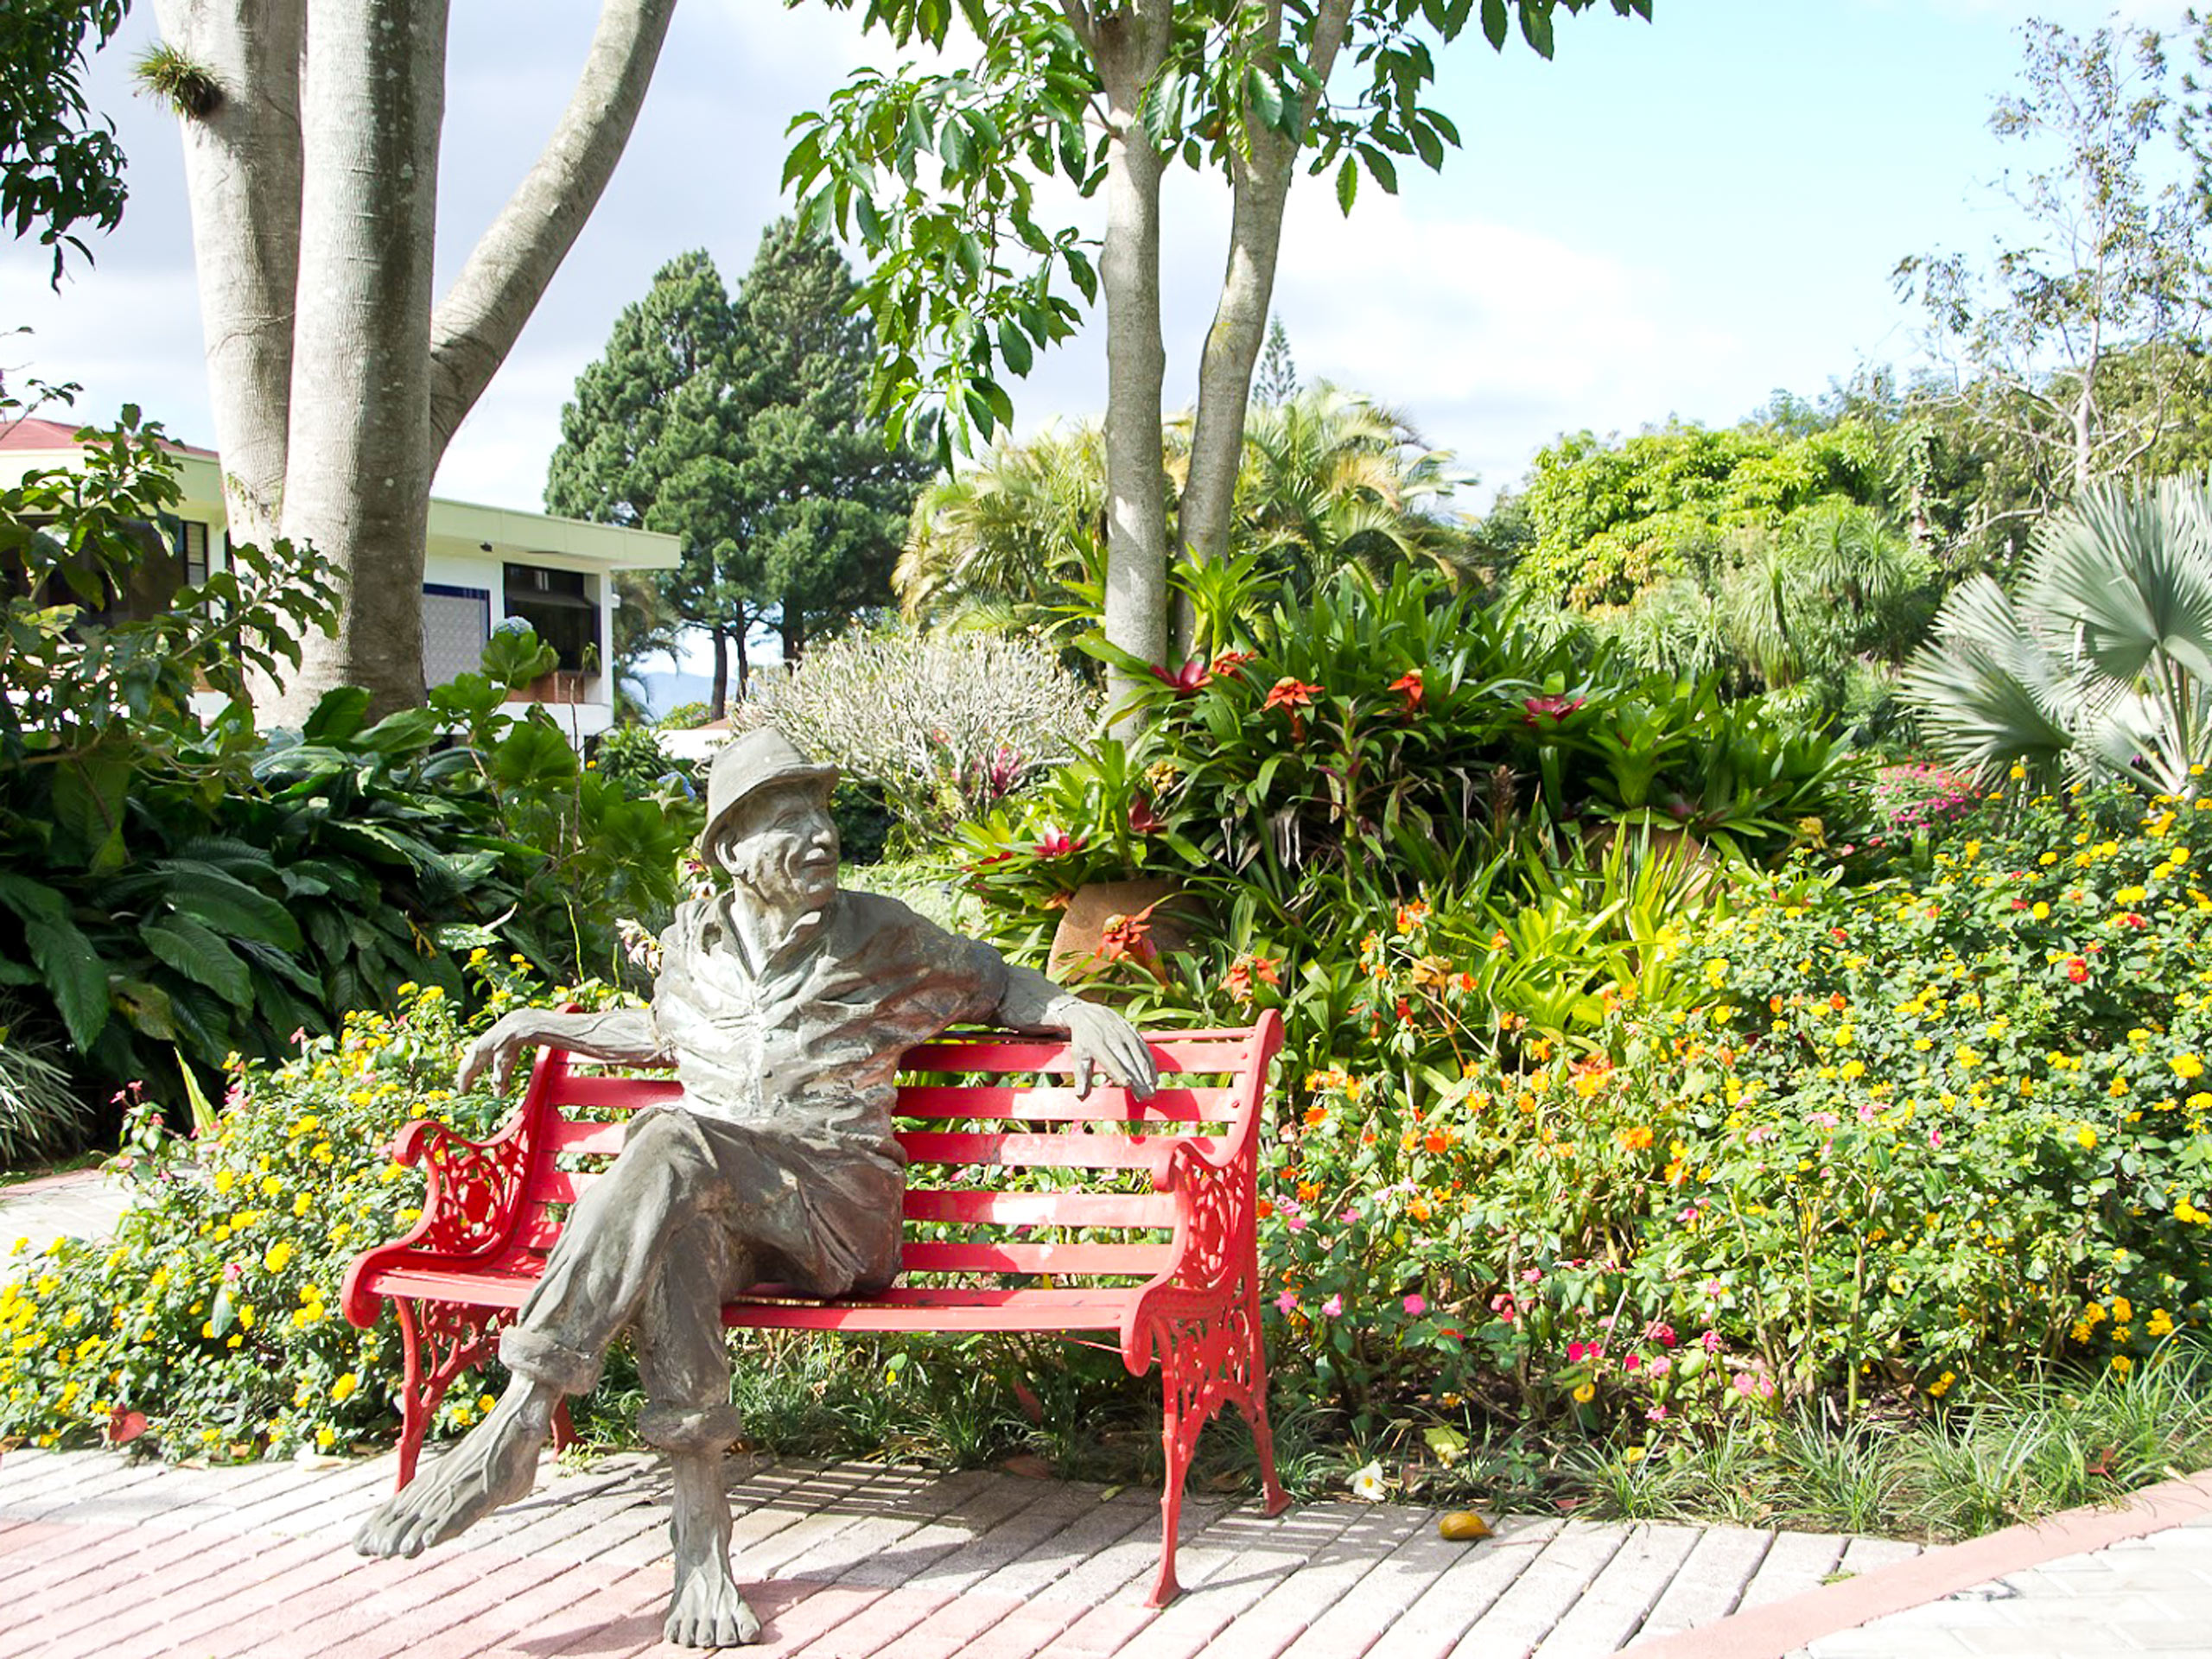 Bougainvillea Hotel garden statue on a bench